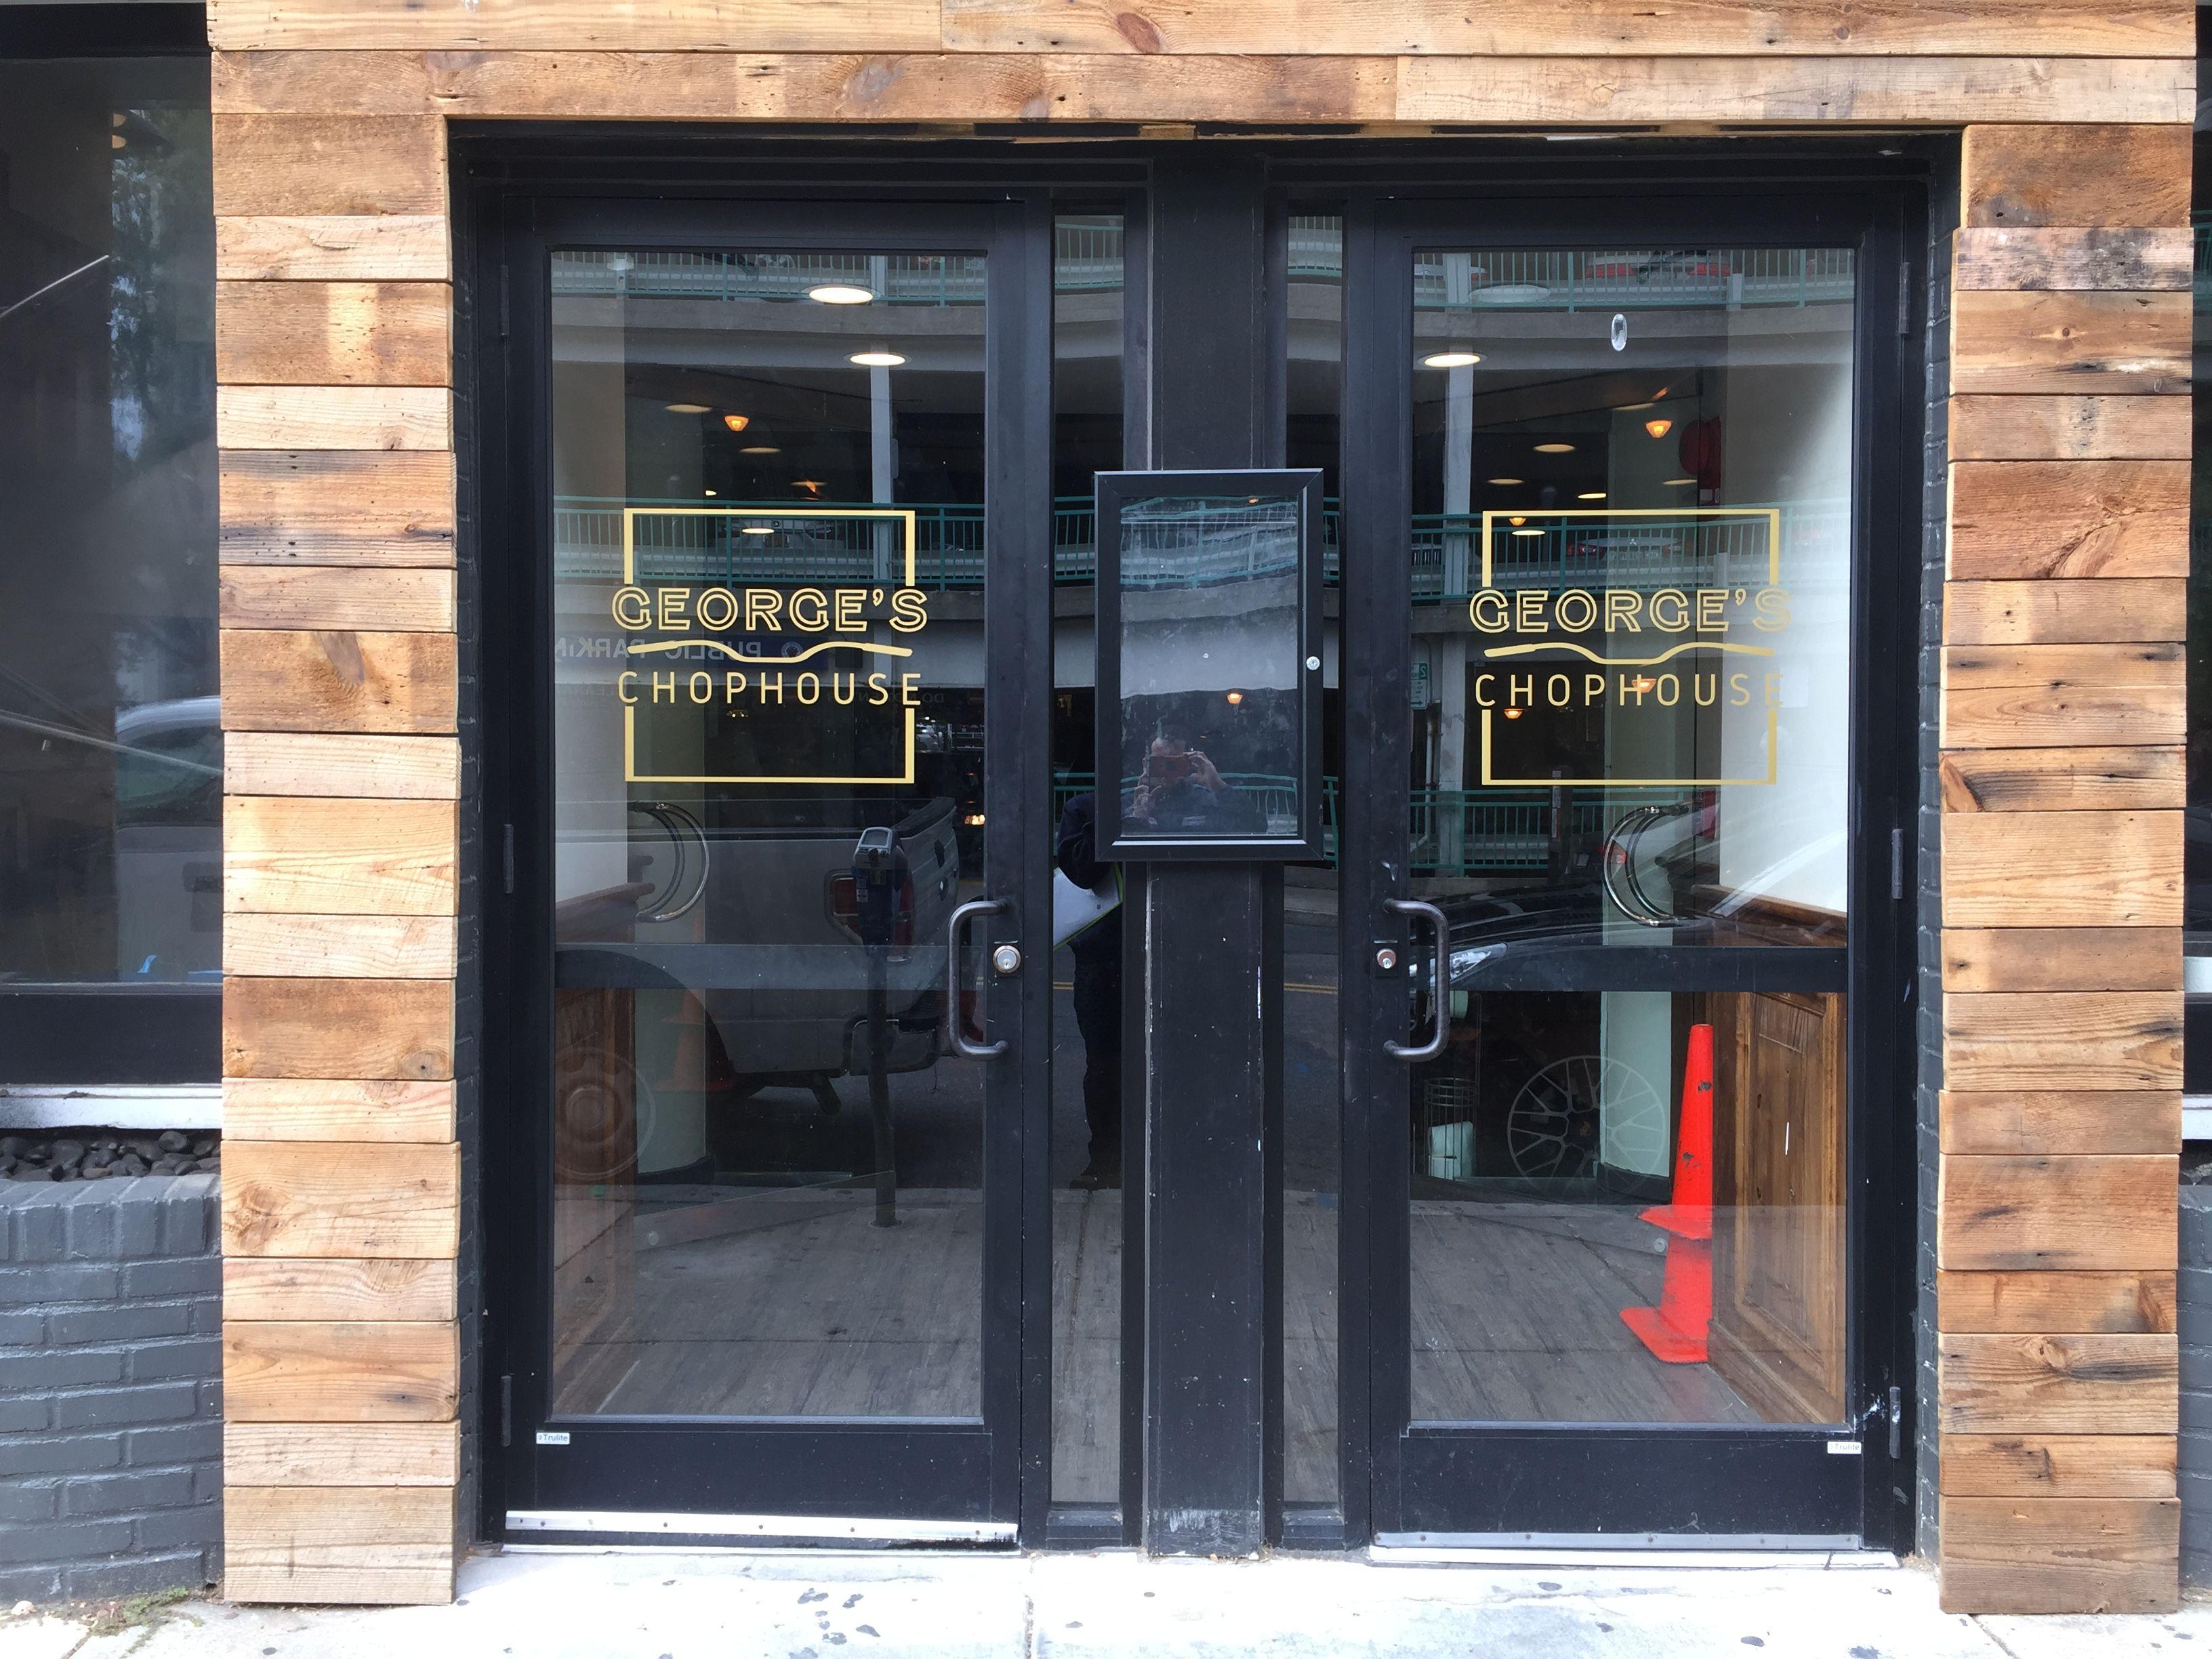 Merveilleux ... MD Gold Vinyl Logos On Exterior Doors For Georgeu0027s Chophouse In  Bethesda, ...